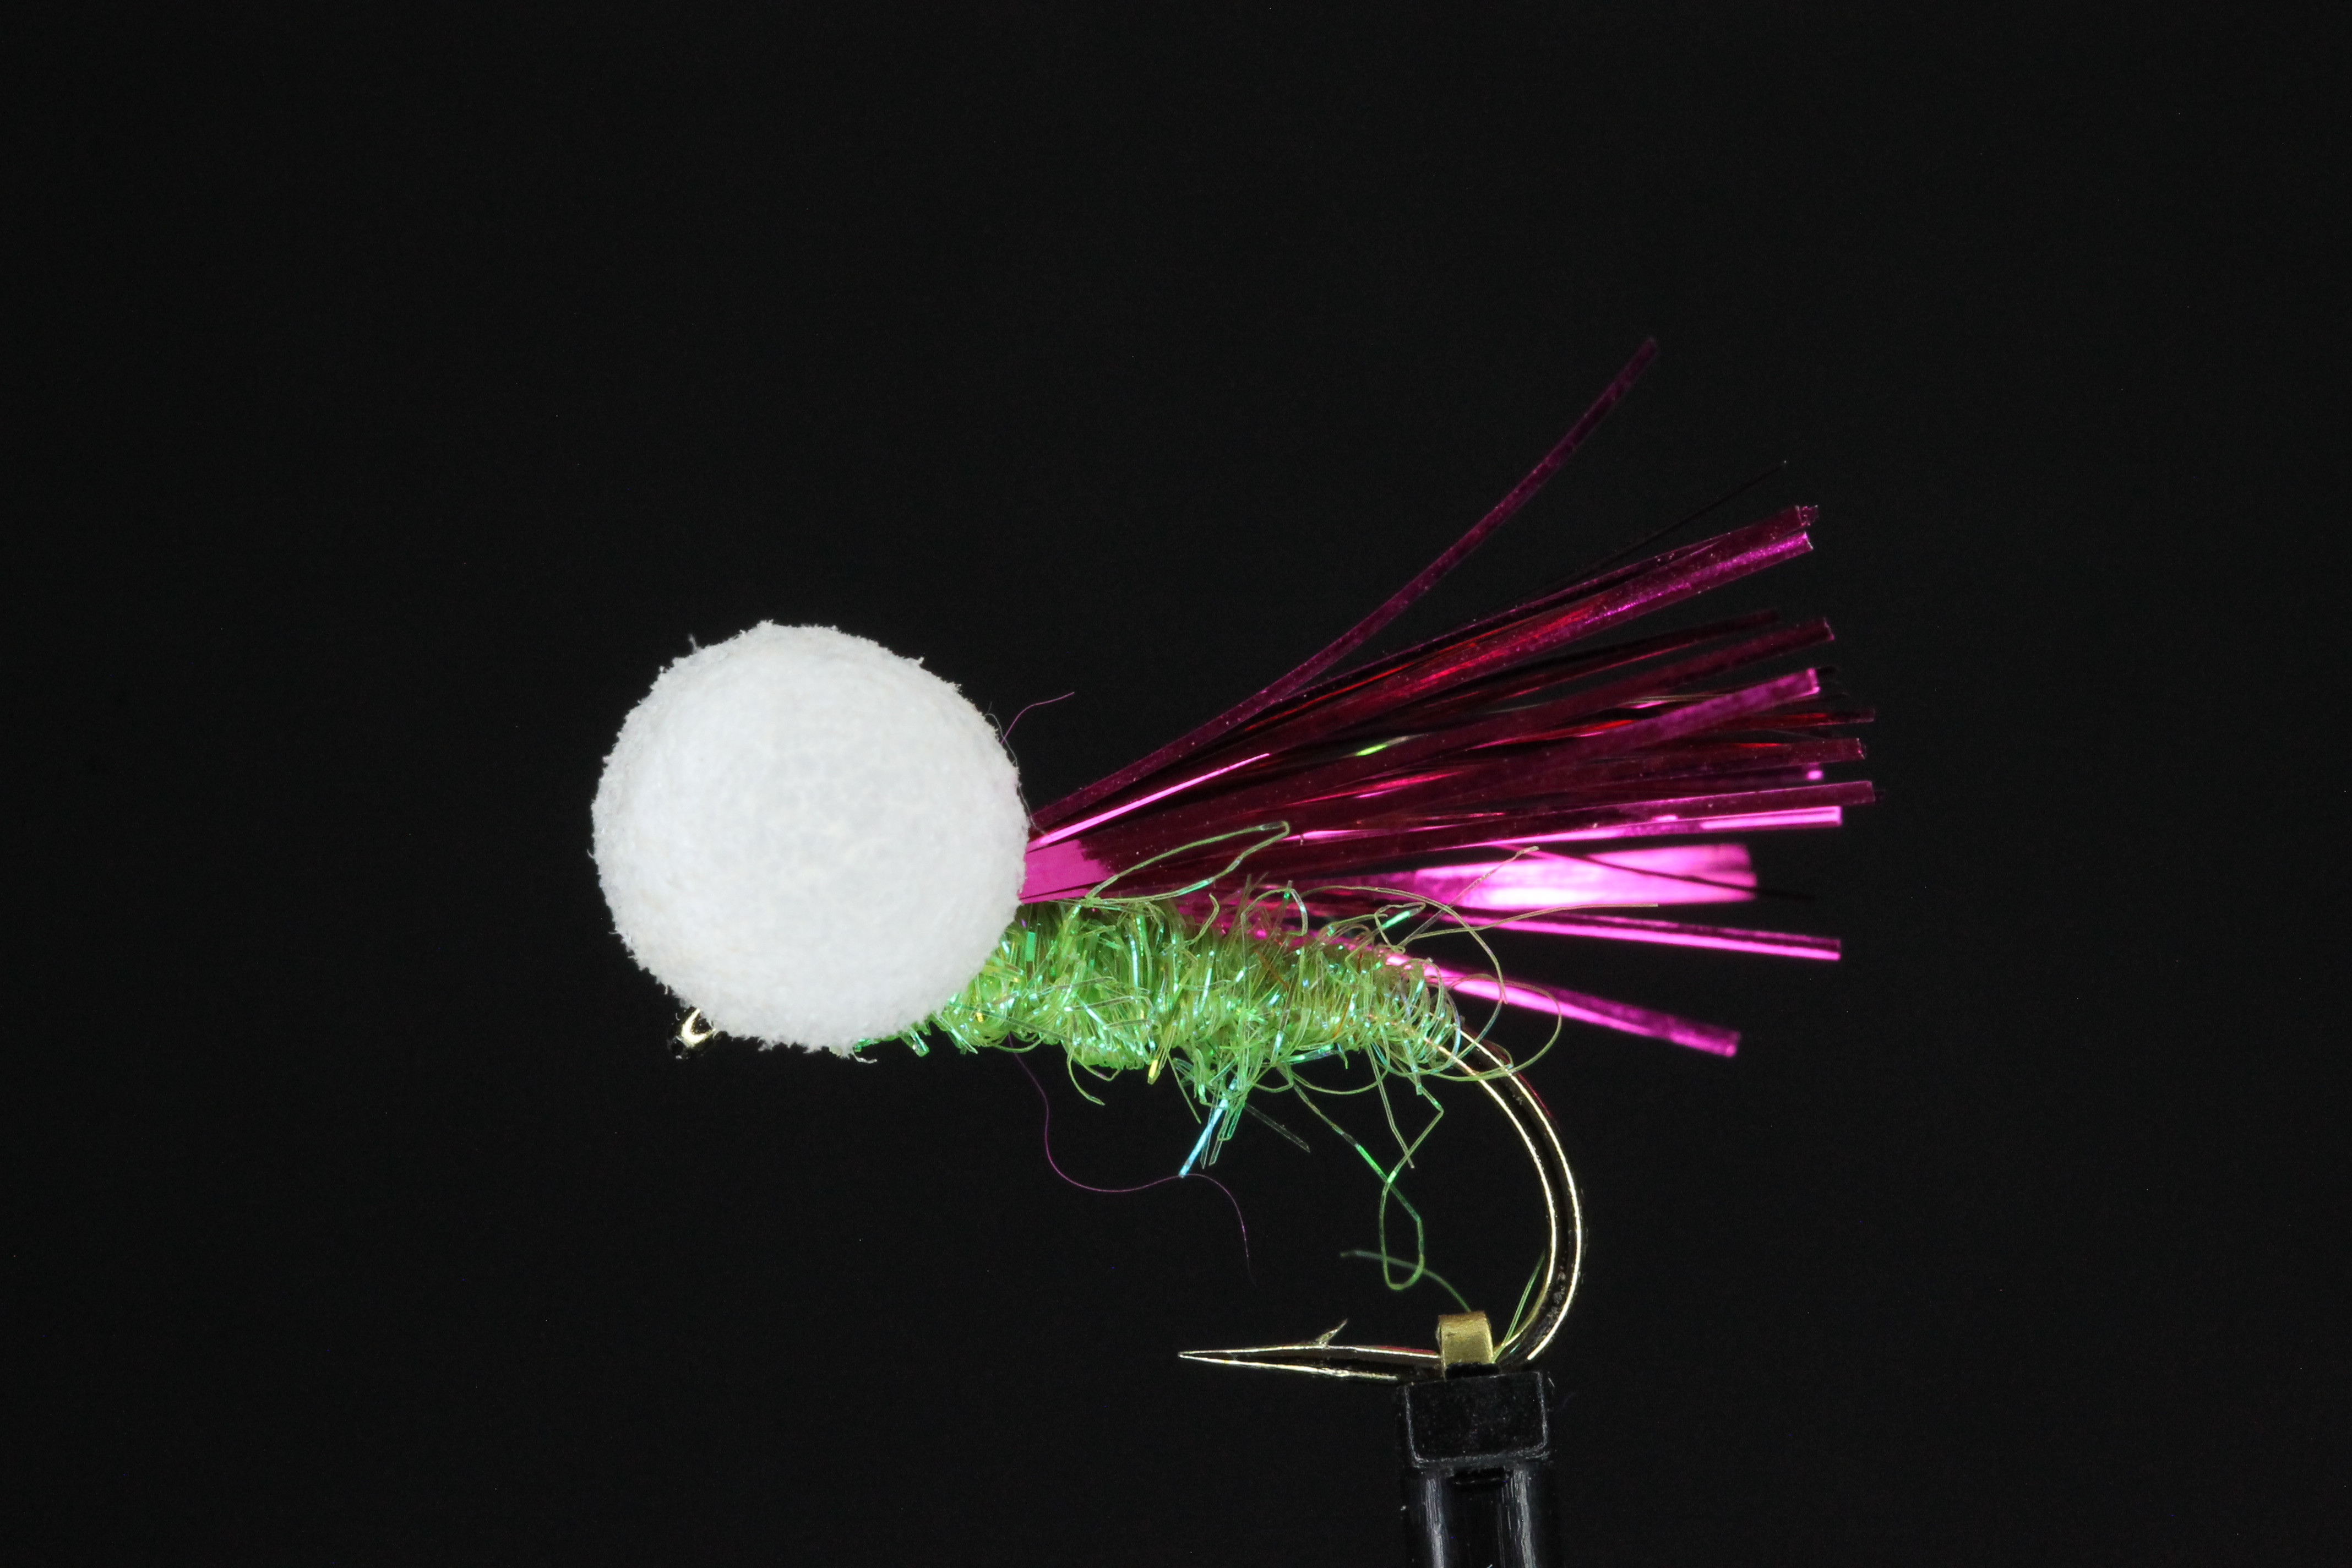 Dynamite Booby - Pink Shine